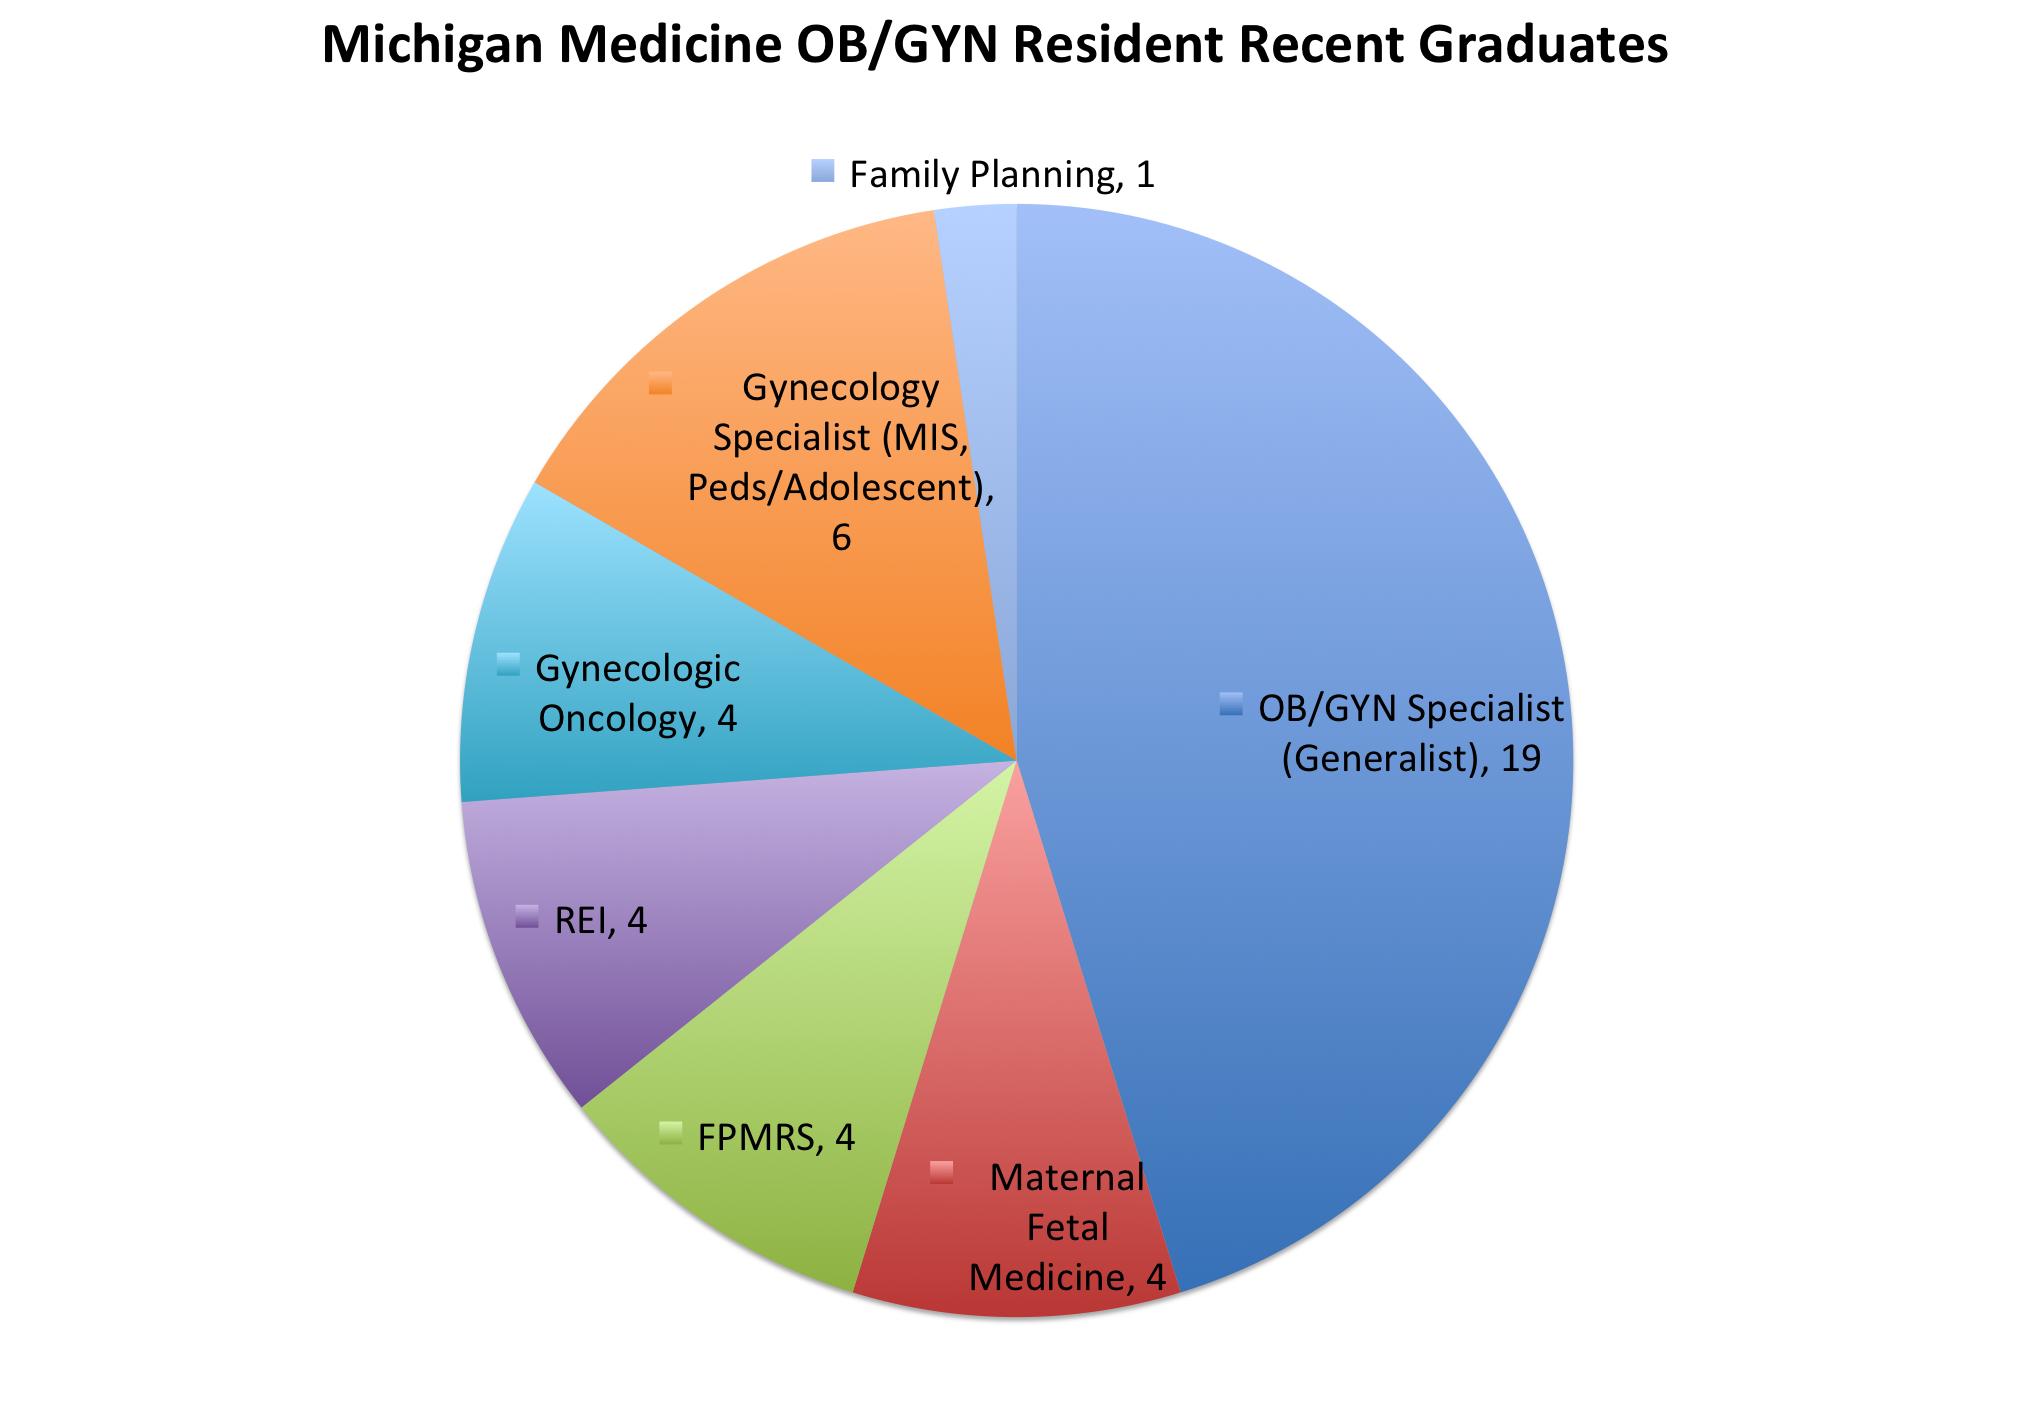 obgyn resident pie chart